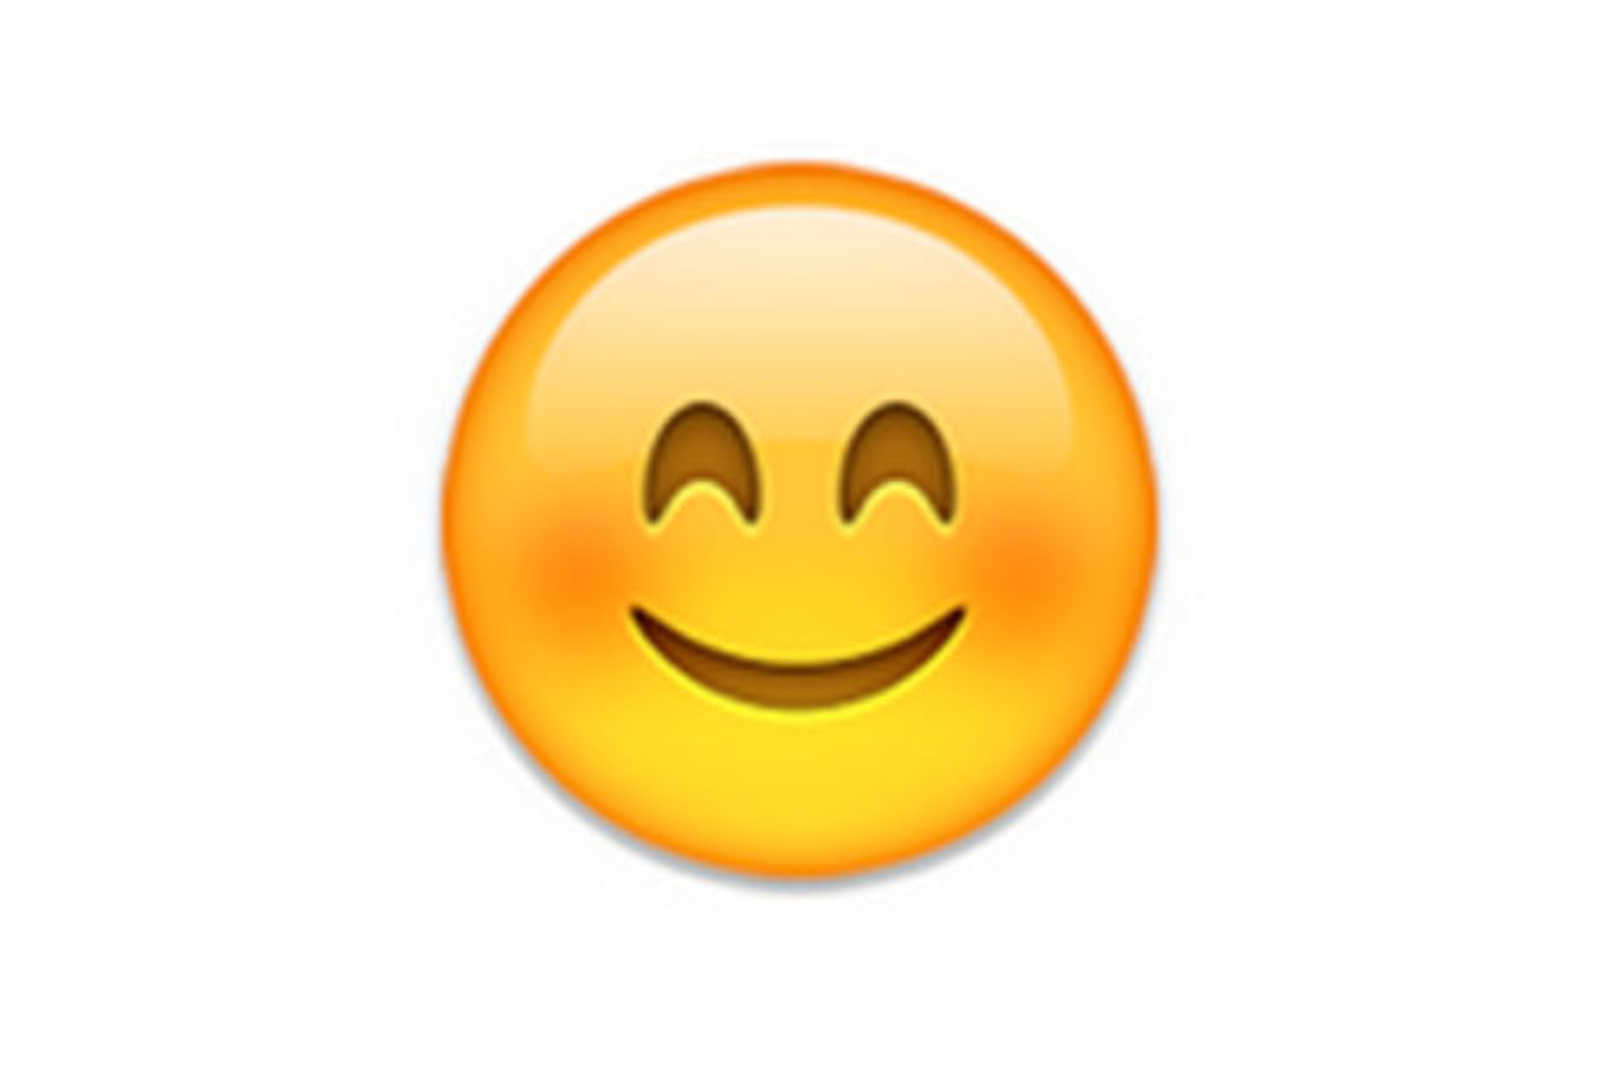 Smiley kuss senden